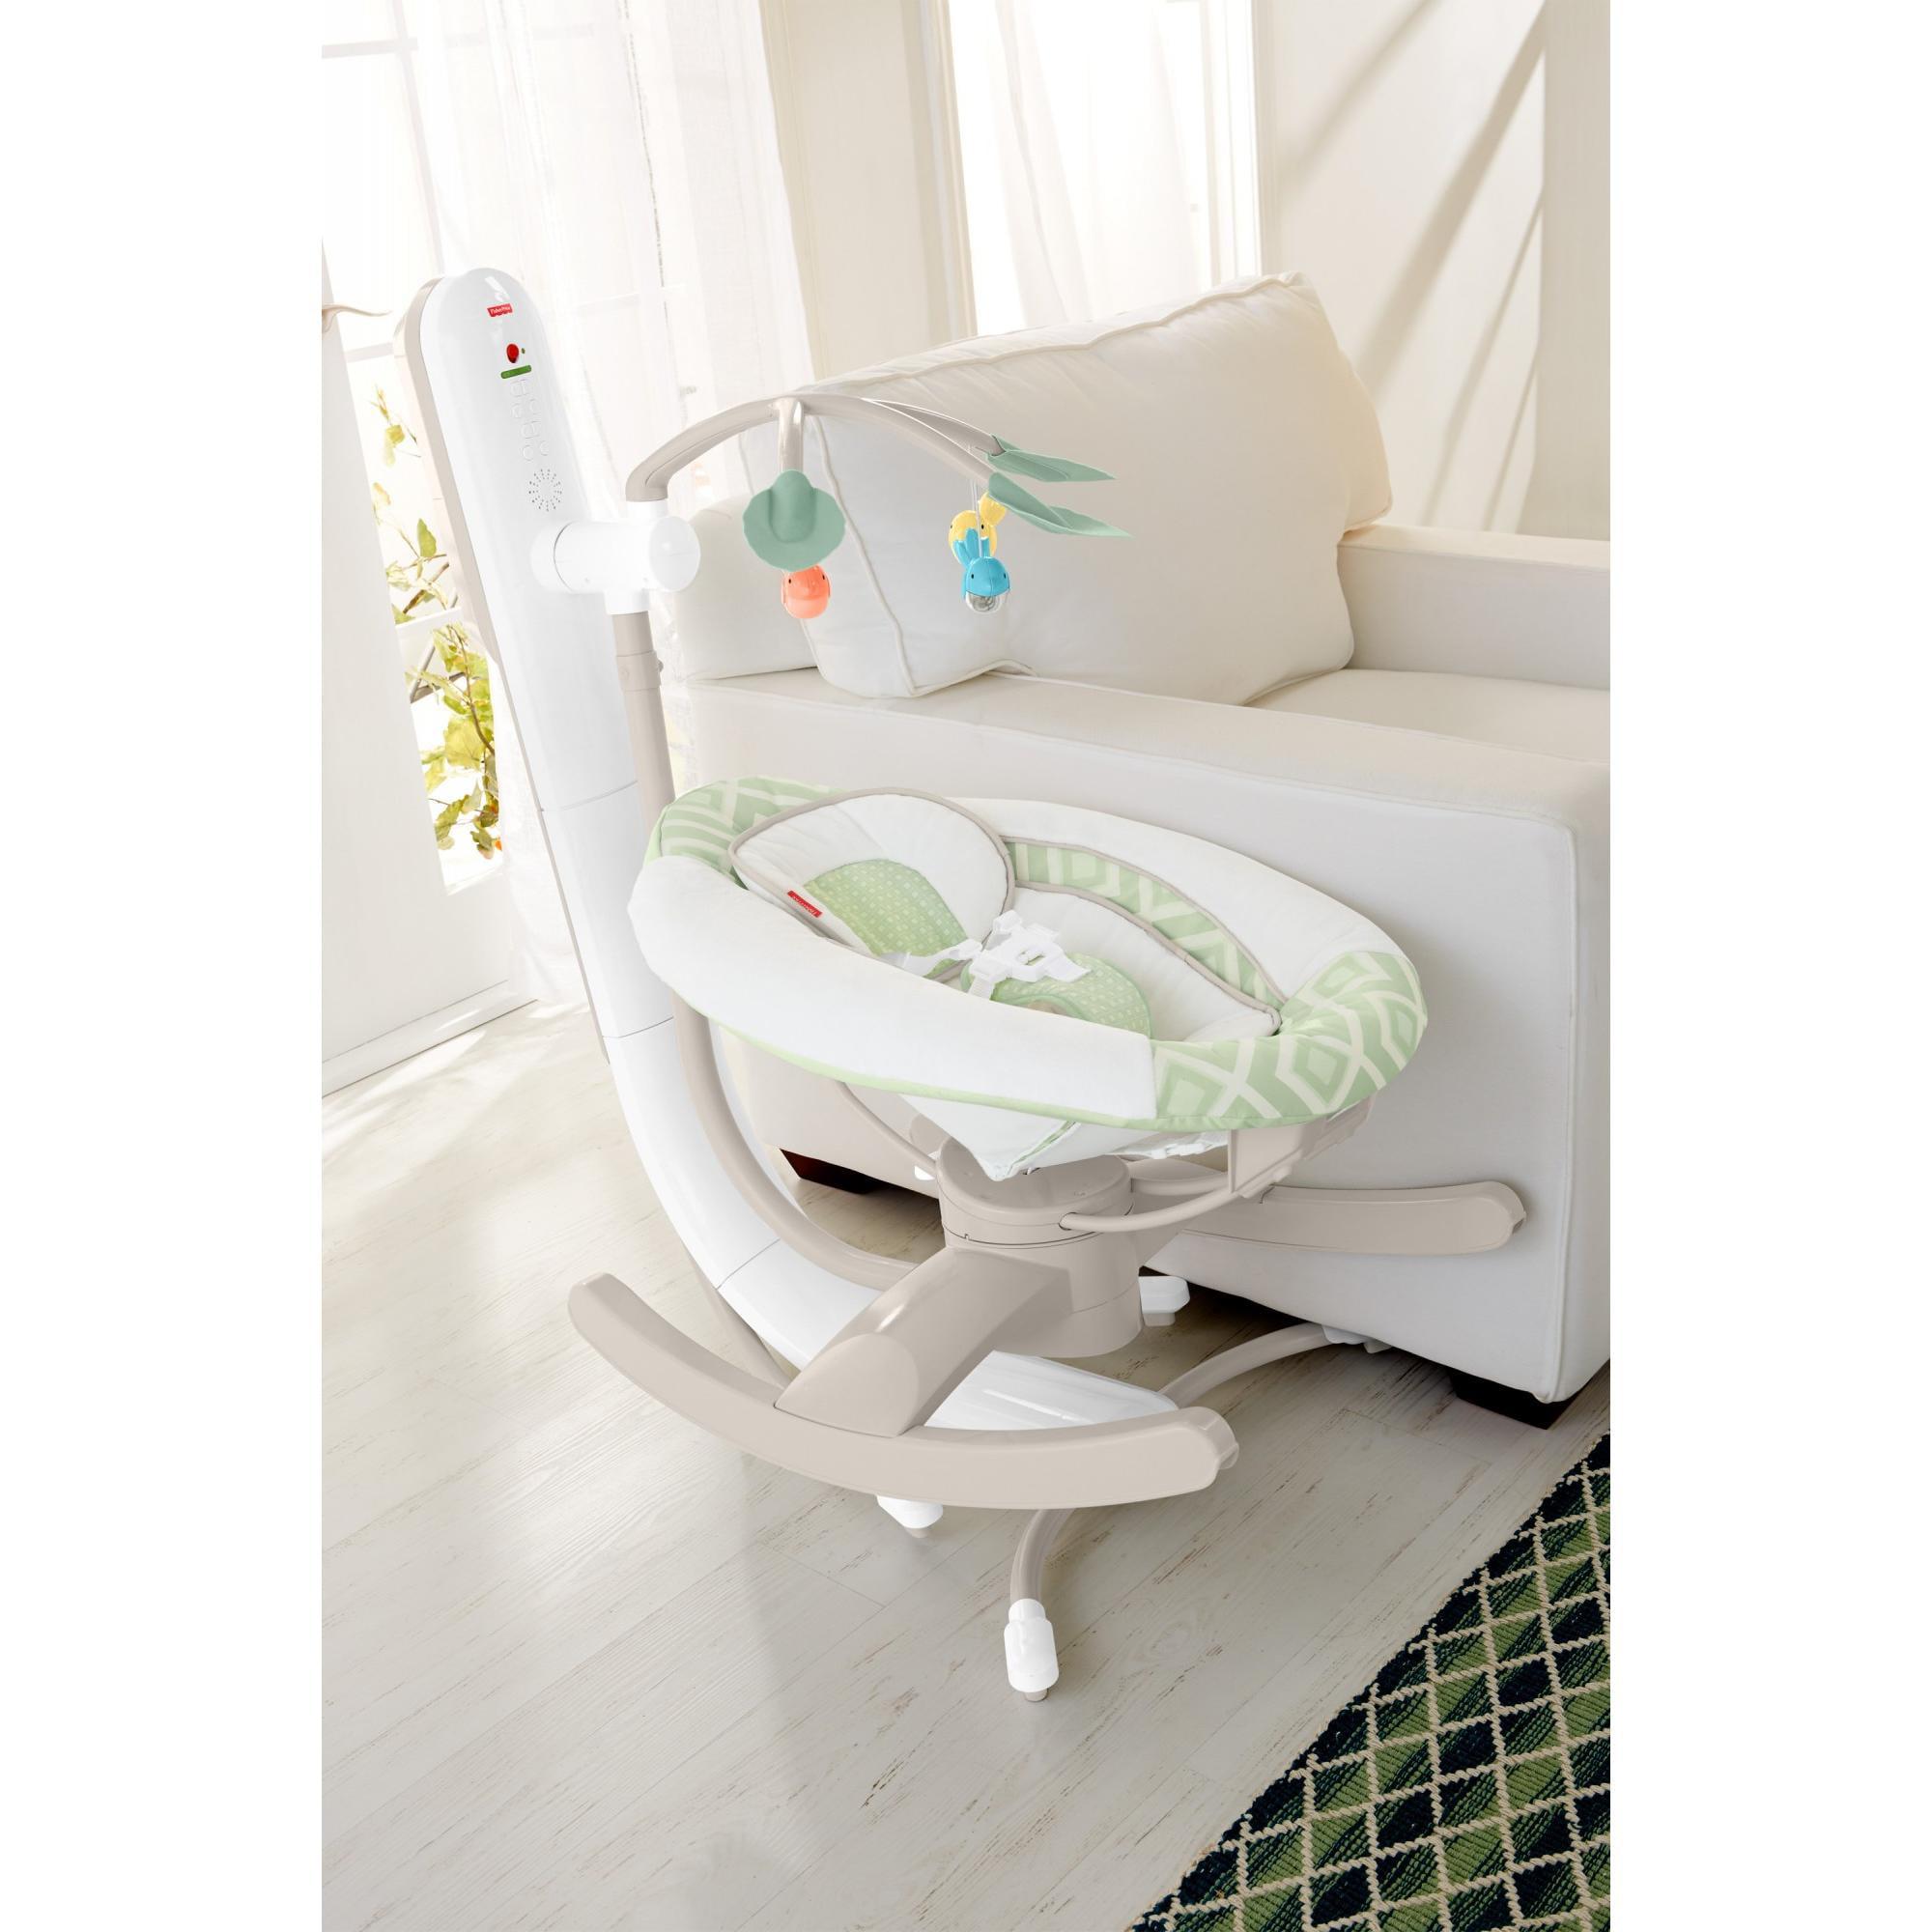 Baby boy swing chair - Baby Boy Swing Chair With Baby Boy Swing Chair